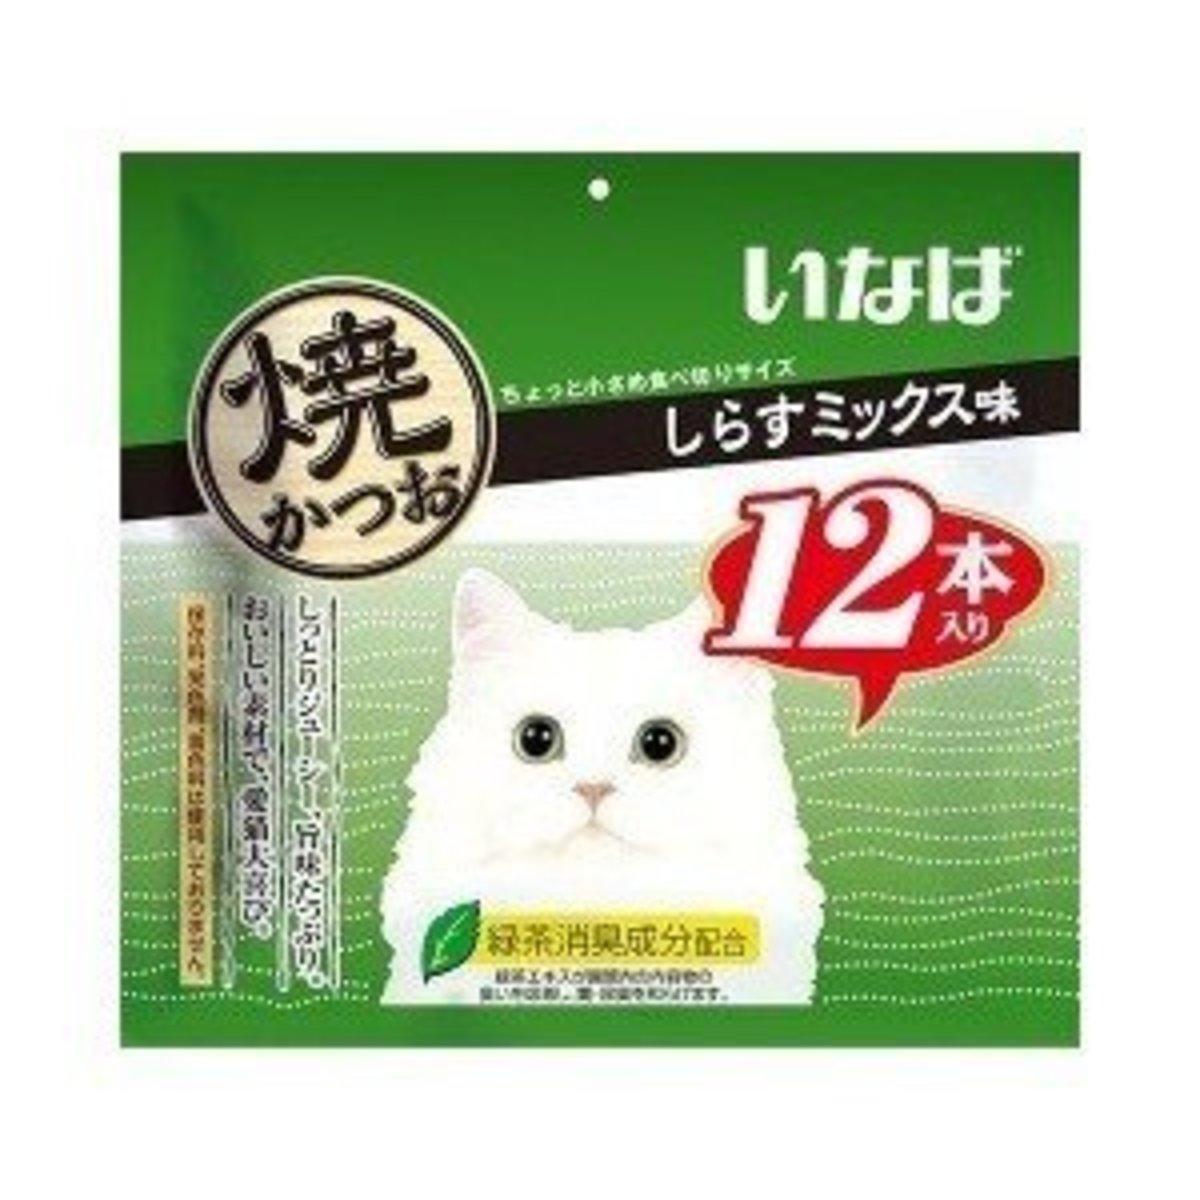 CIAO燒鰹魚條 しらすミックス味 小包裝 15g [銀魚口味] (綠) 12條袋裝